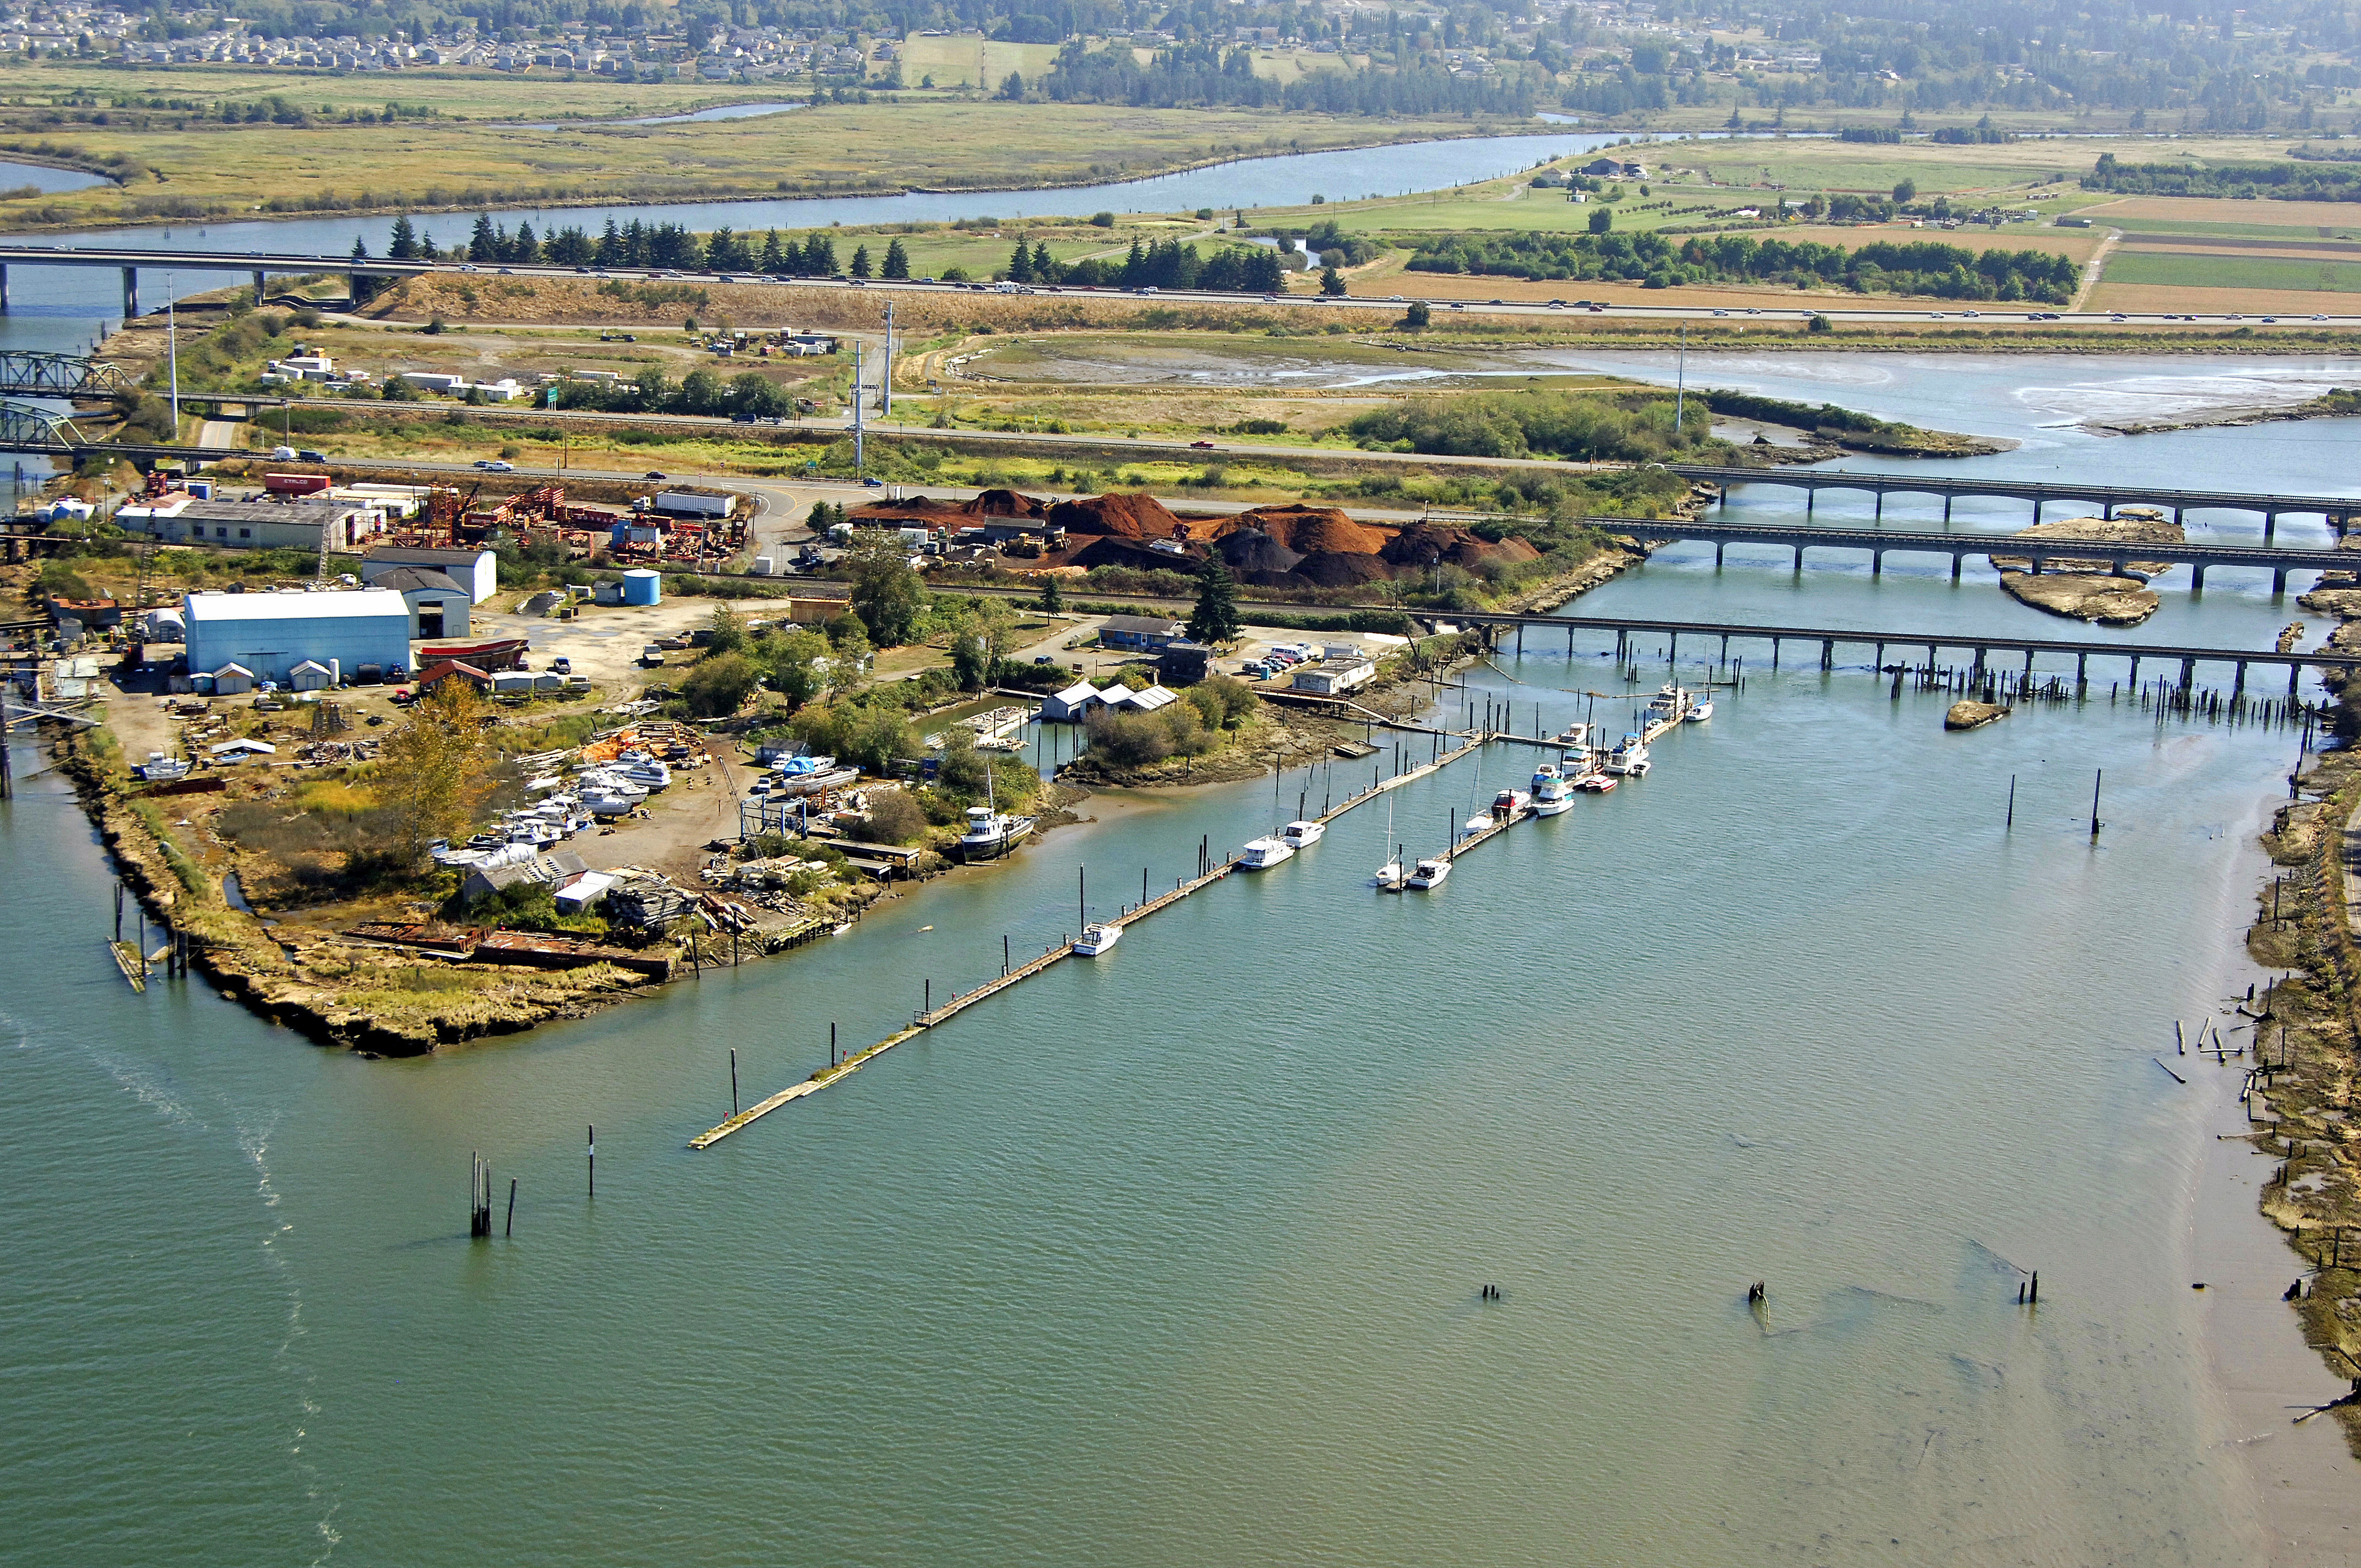 Seacrest Marina In Everett Wa United States Marina